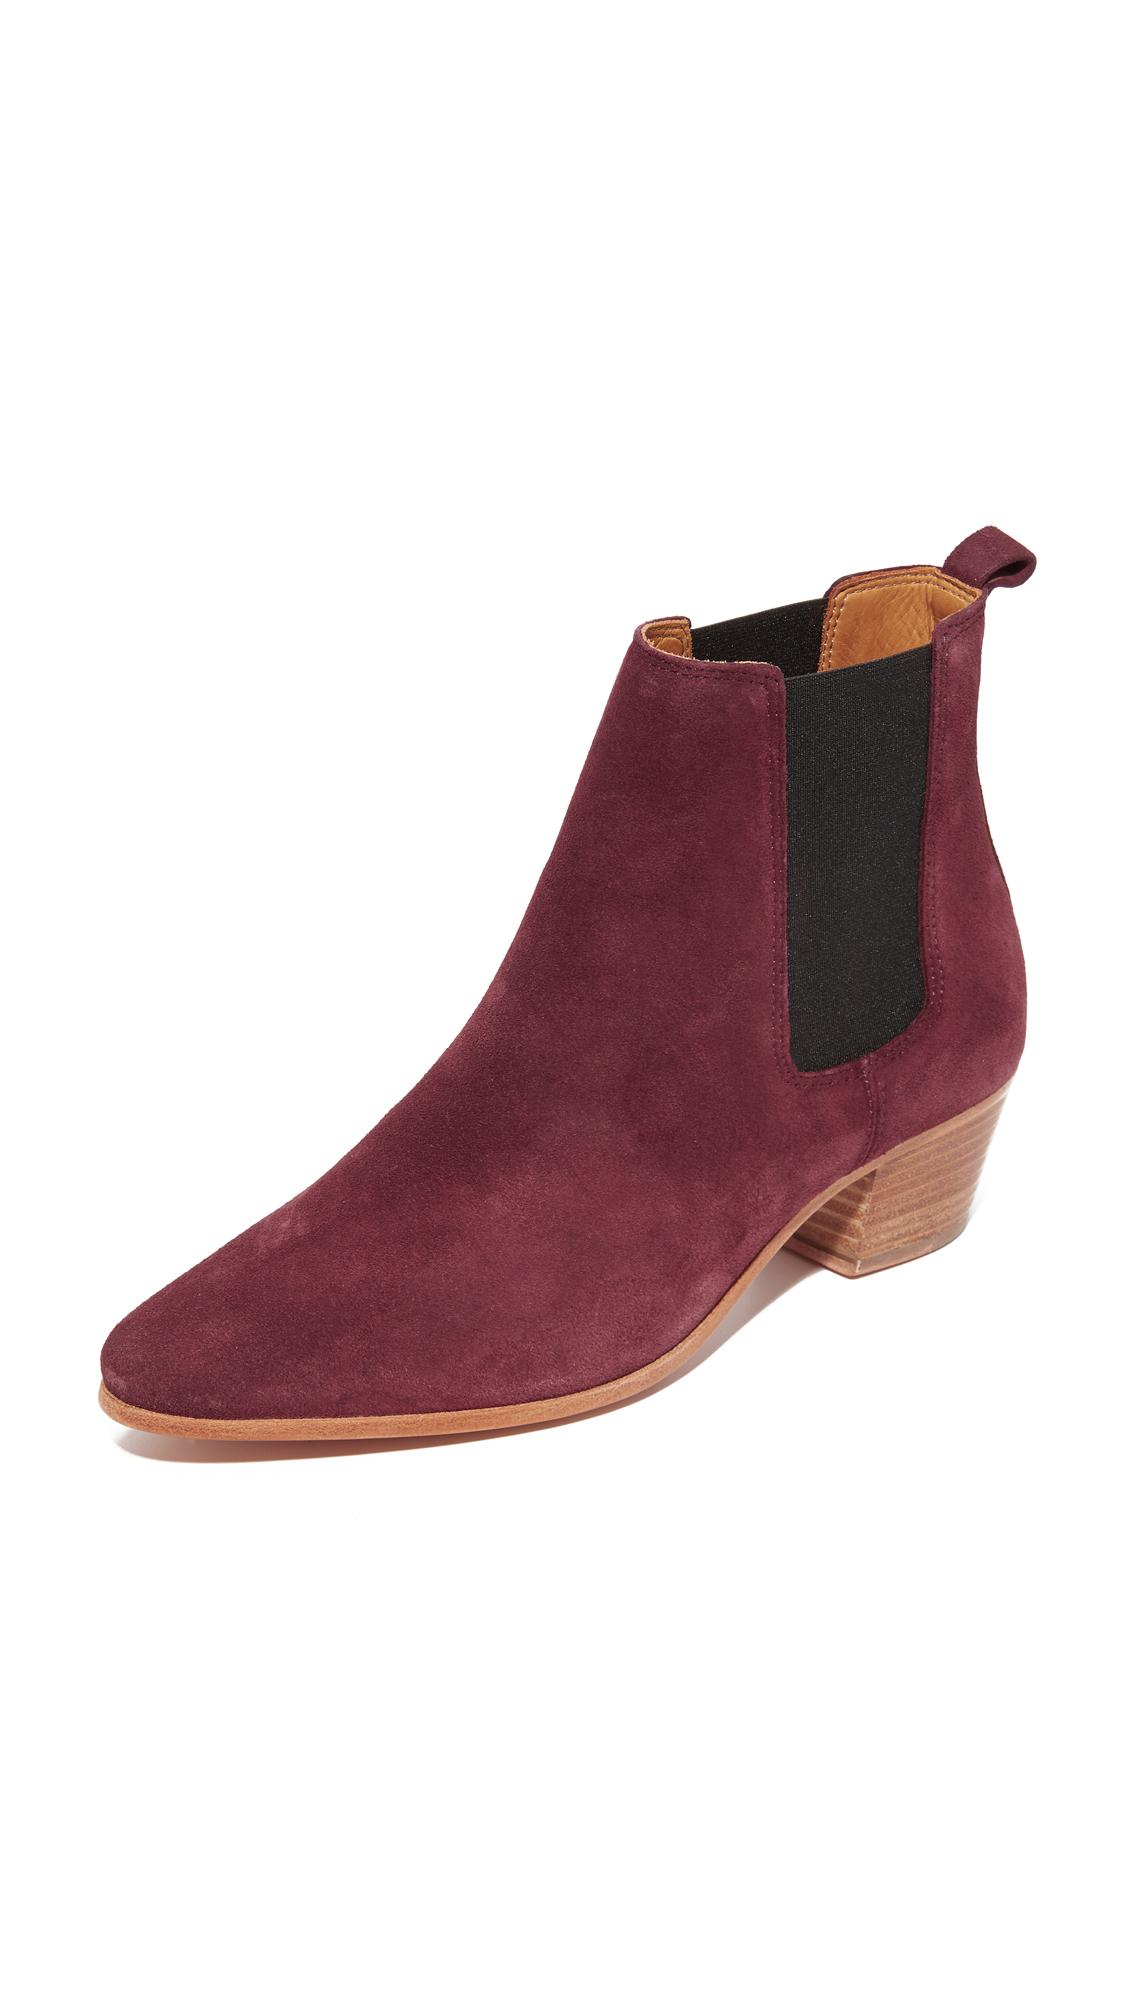 Photo of IRO Yvette Chelsea Booties online shoes sales